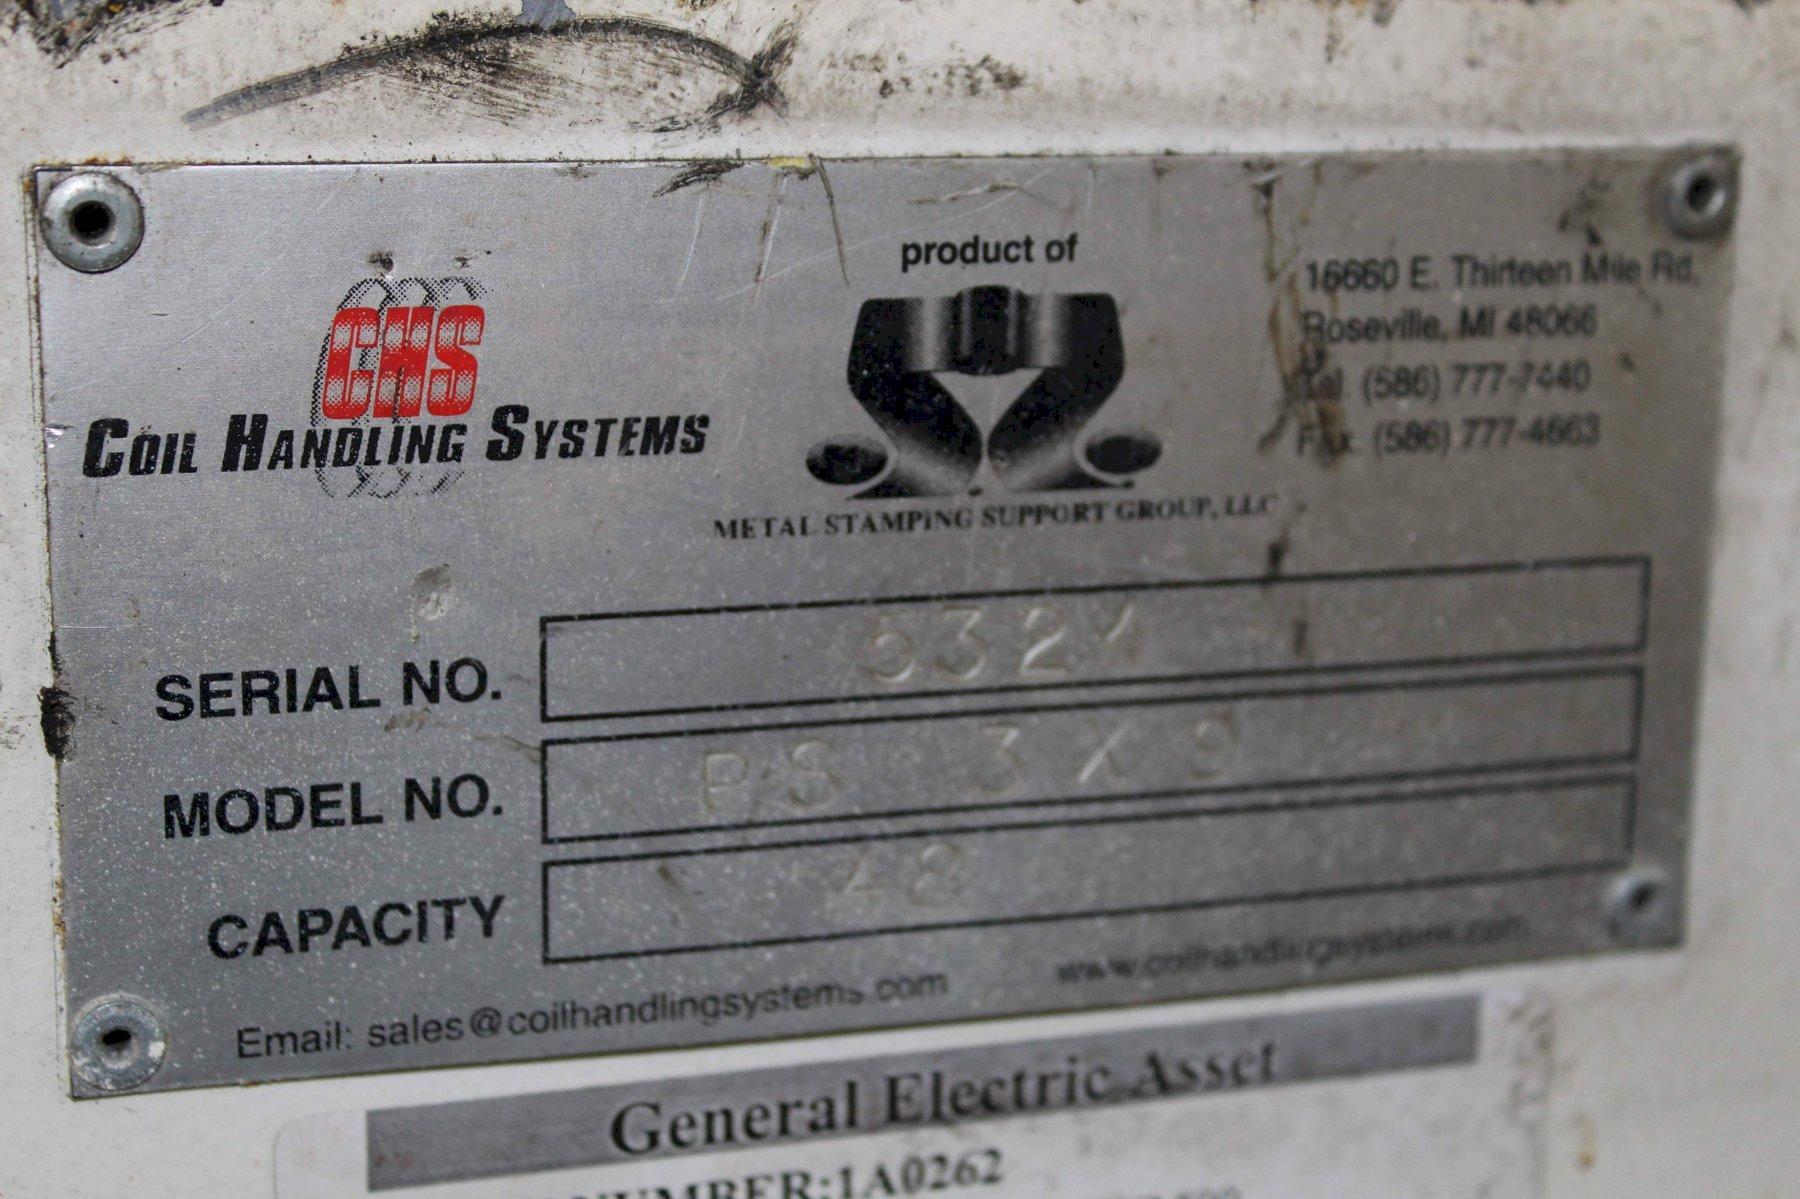 48' COIL HANDLING SYSTEMS STRAIGHTENER: STOCK #67553